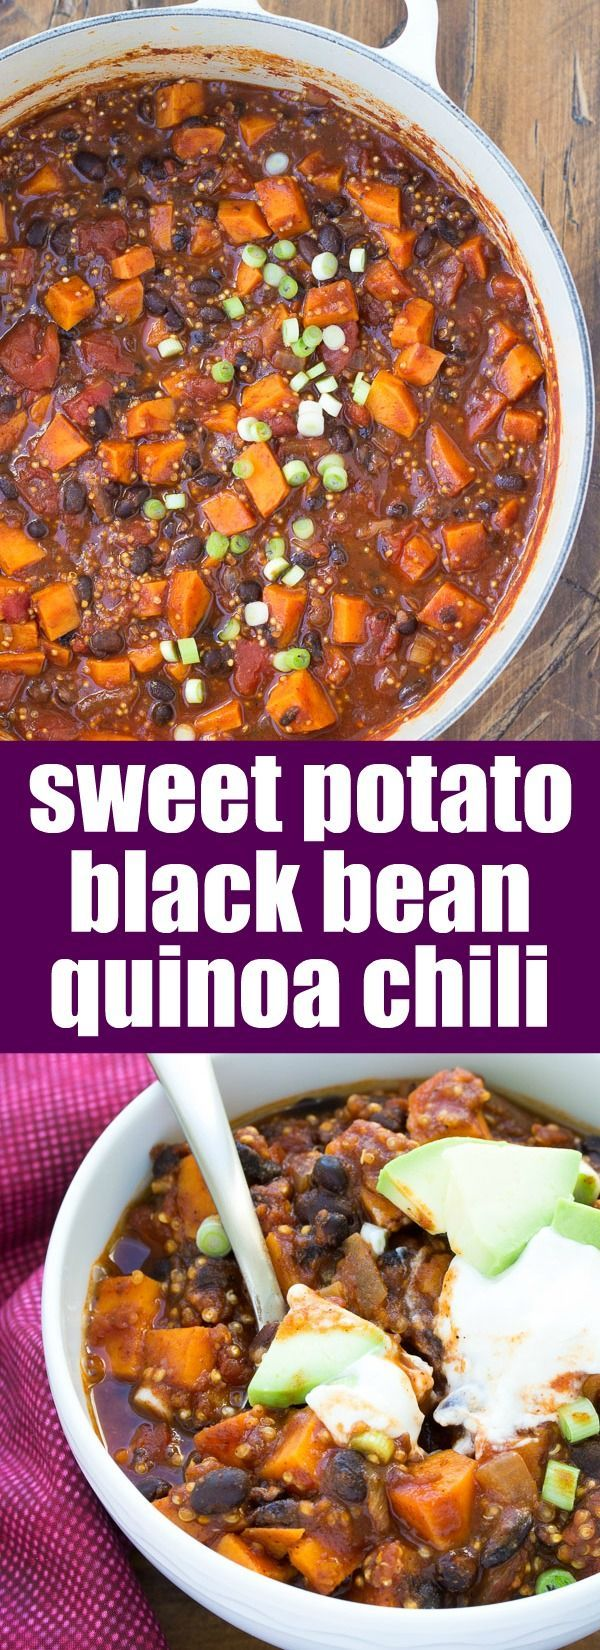 Sweet Potato and Black Bean Chili with Quinoa. Vegetarian, vegan option, fast and easy to make!   http://www.kristineskitchenblog.com